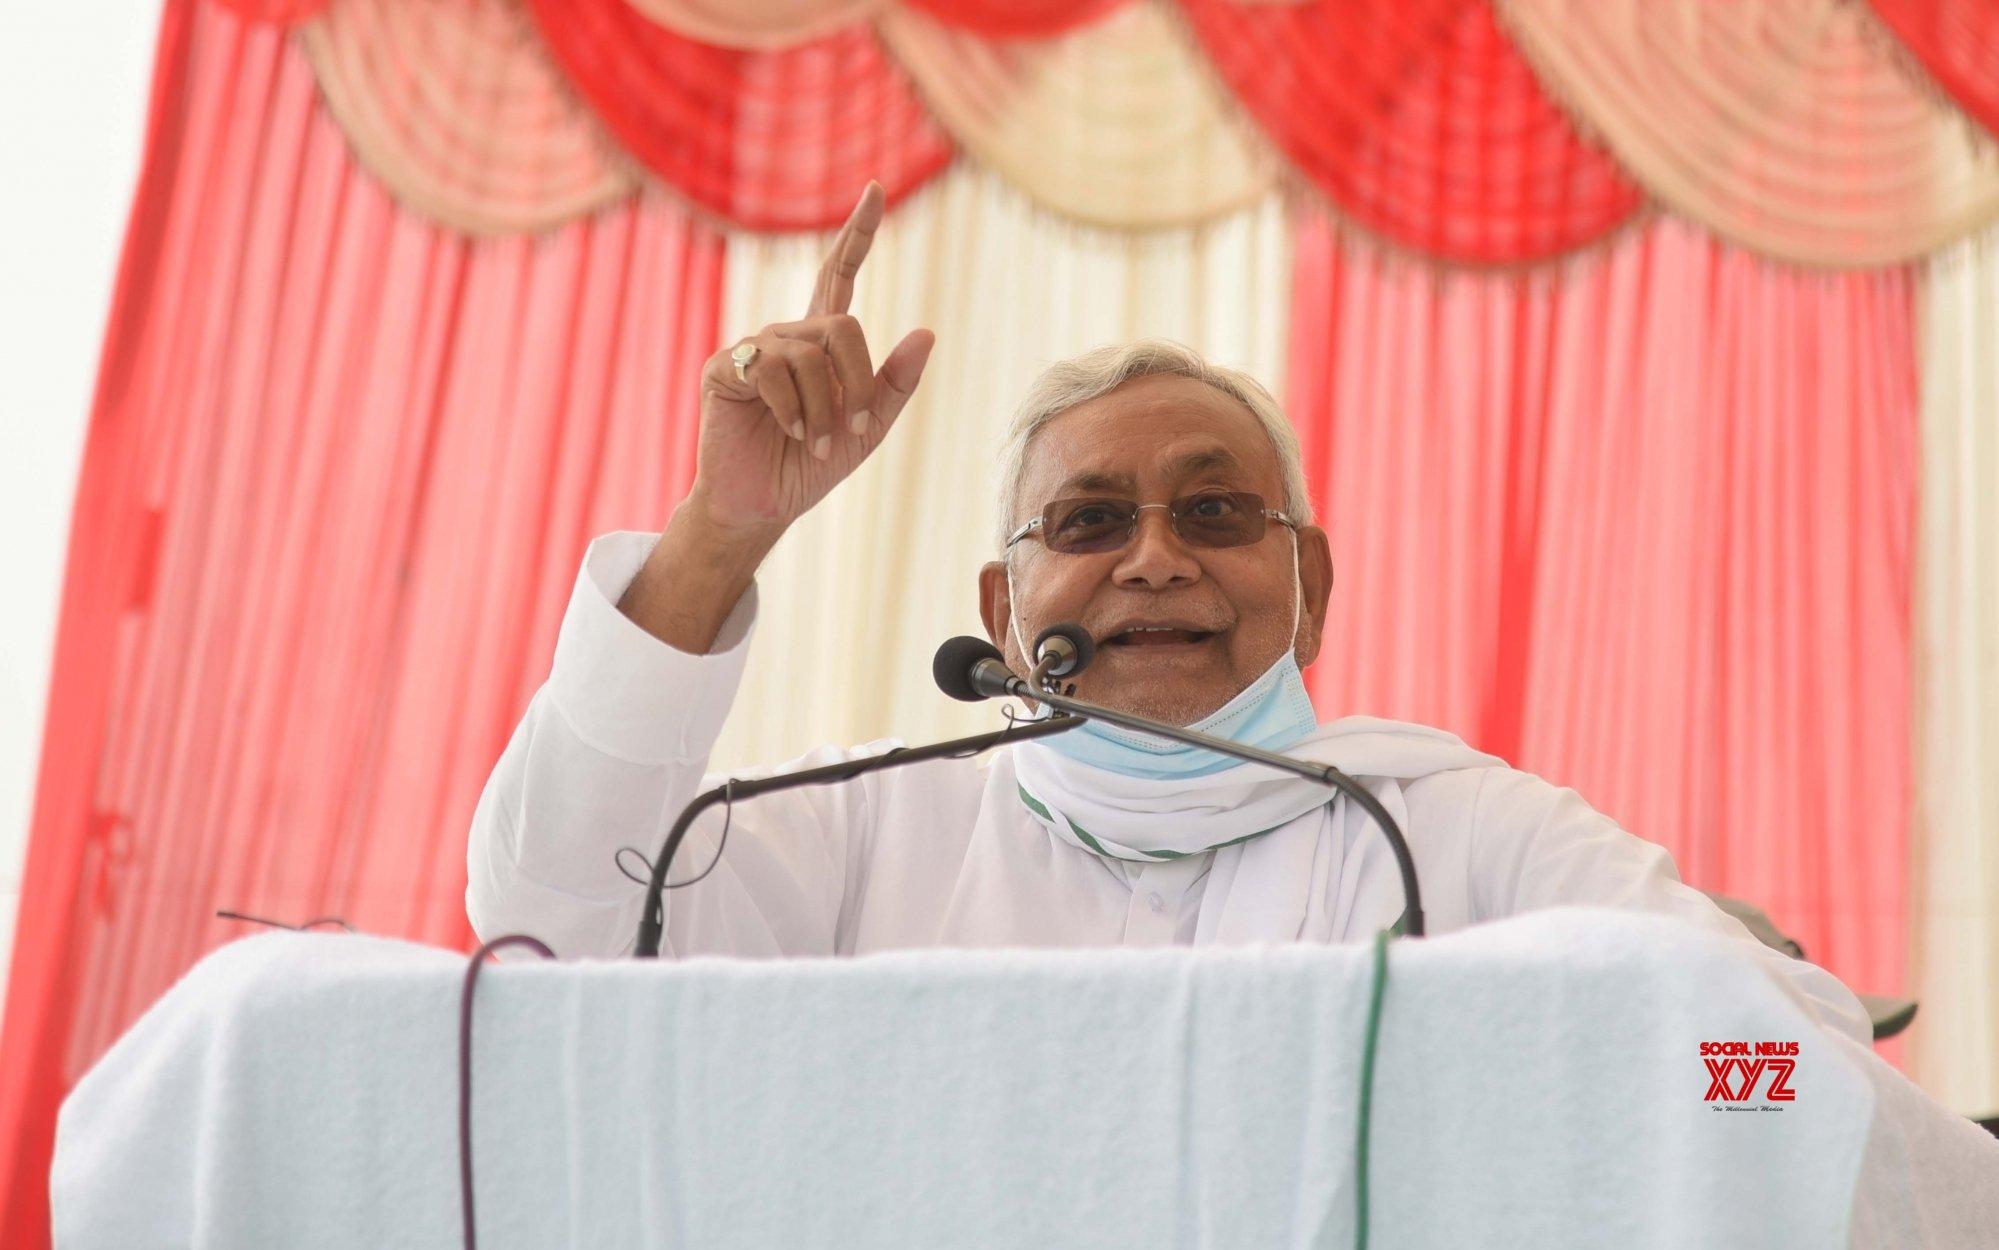 Buxar: Bihar Chief Minister Nitish Kumar addressing an election meeting #Gallery